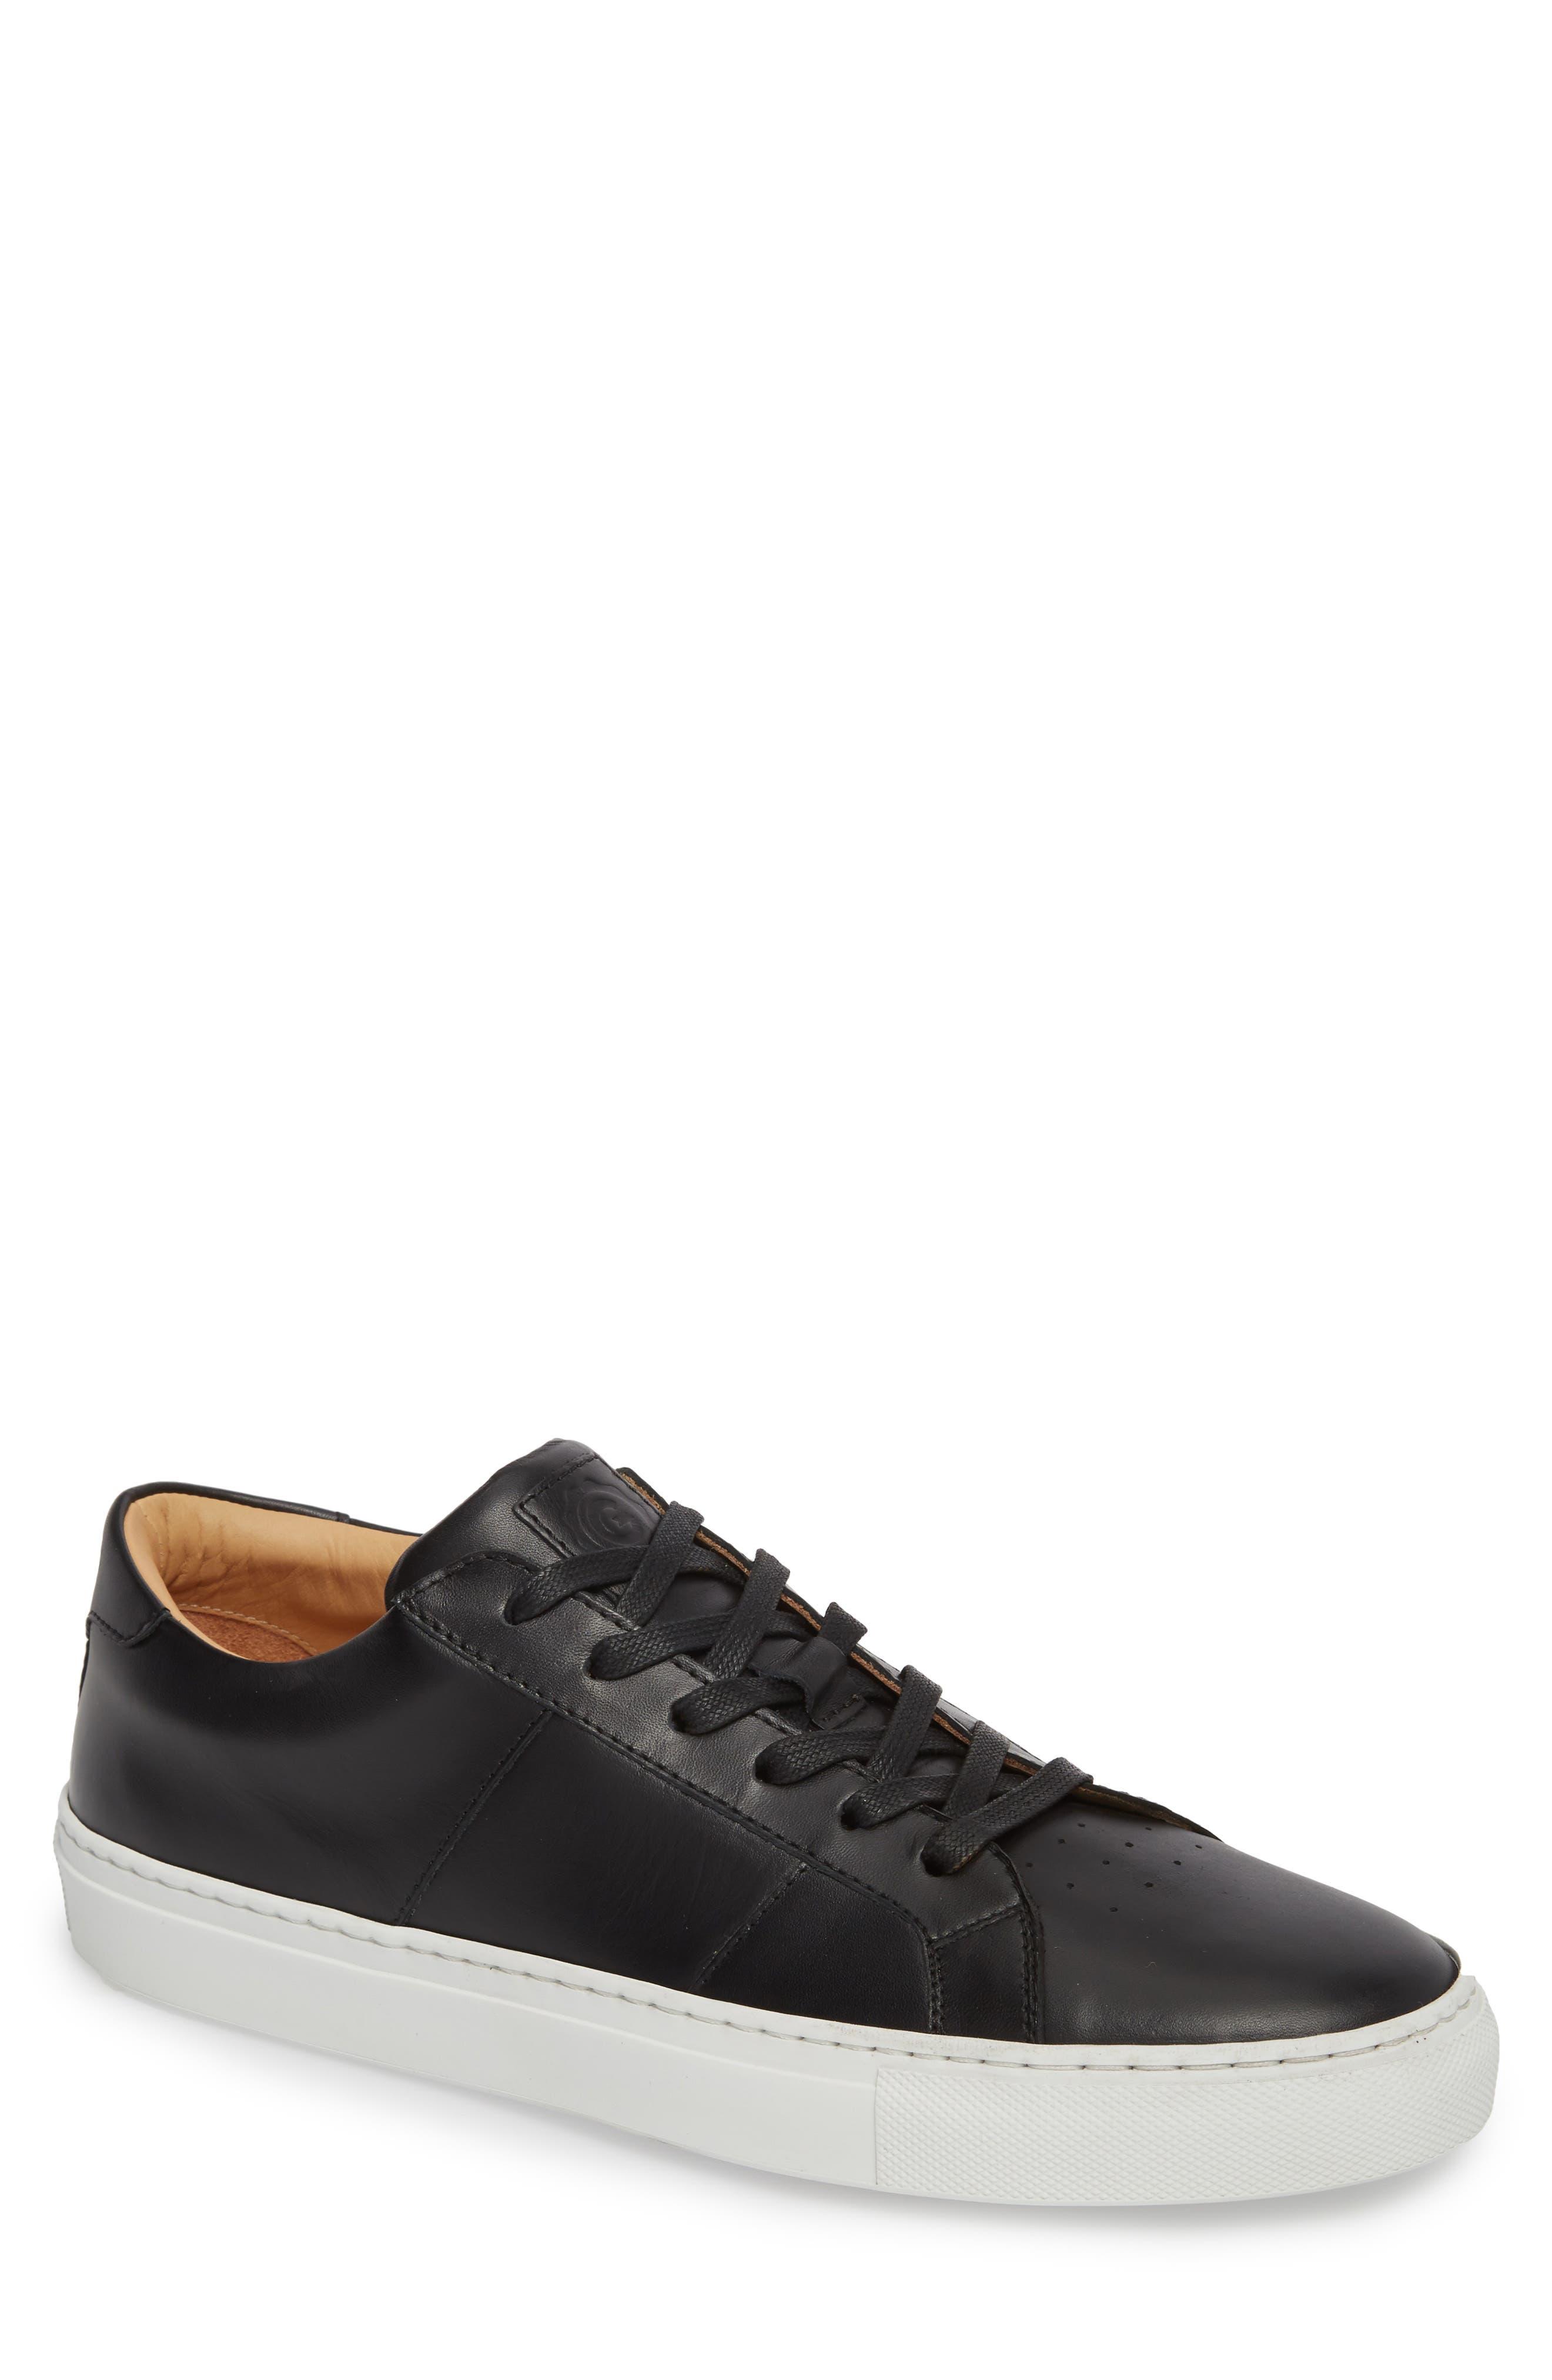 Royale Sneaker,                         Main,                         color, BLACK LEATHER